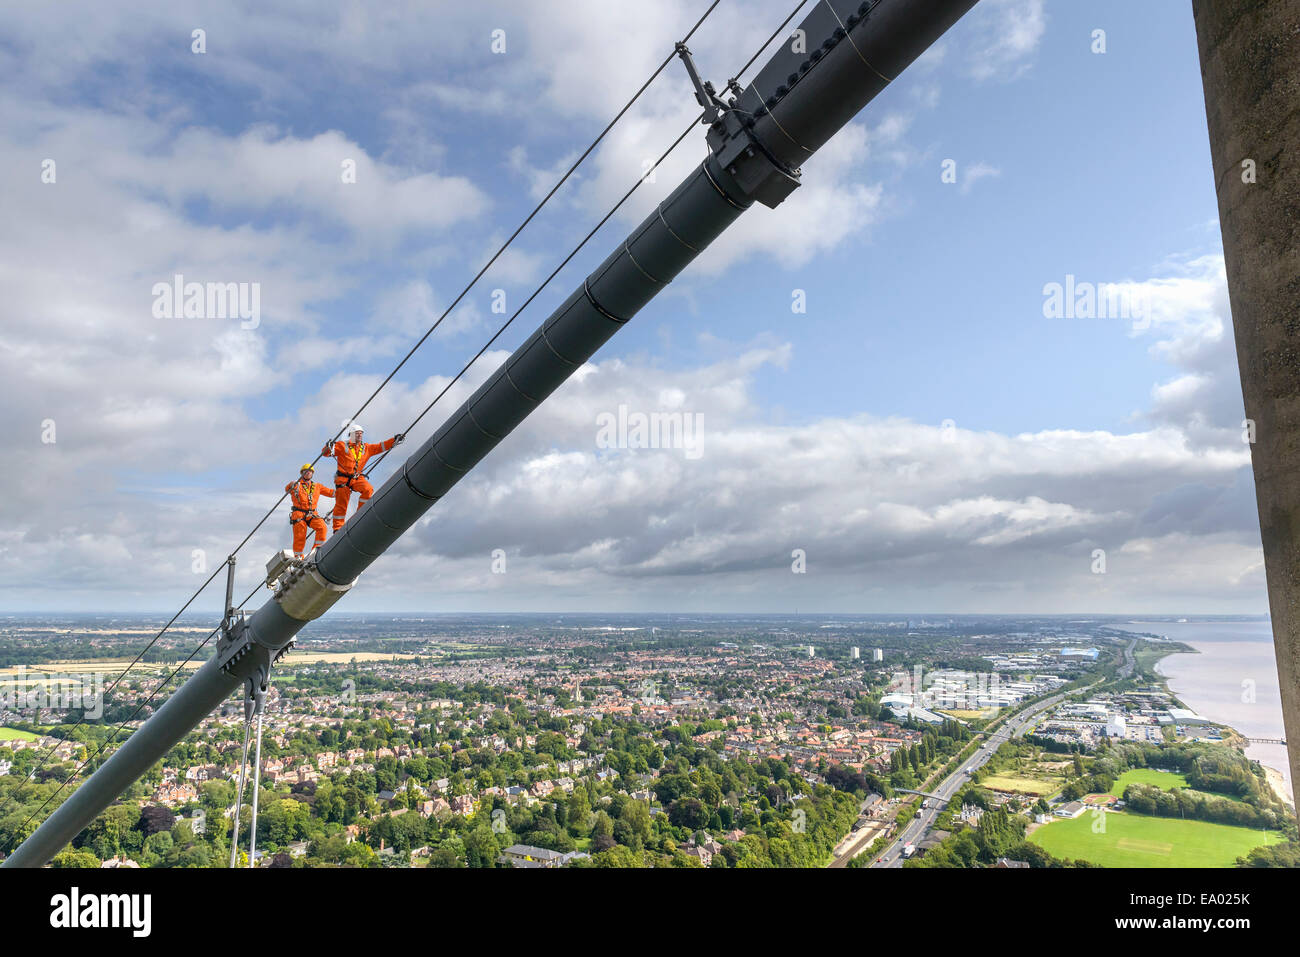 Bridge workers walking on cable of suspension bridge Humber Bridge UK was built in 1981 - Stock Image